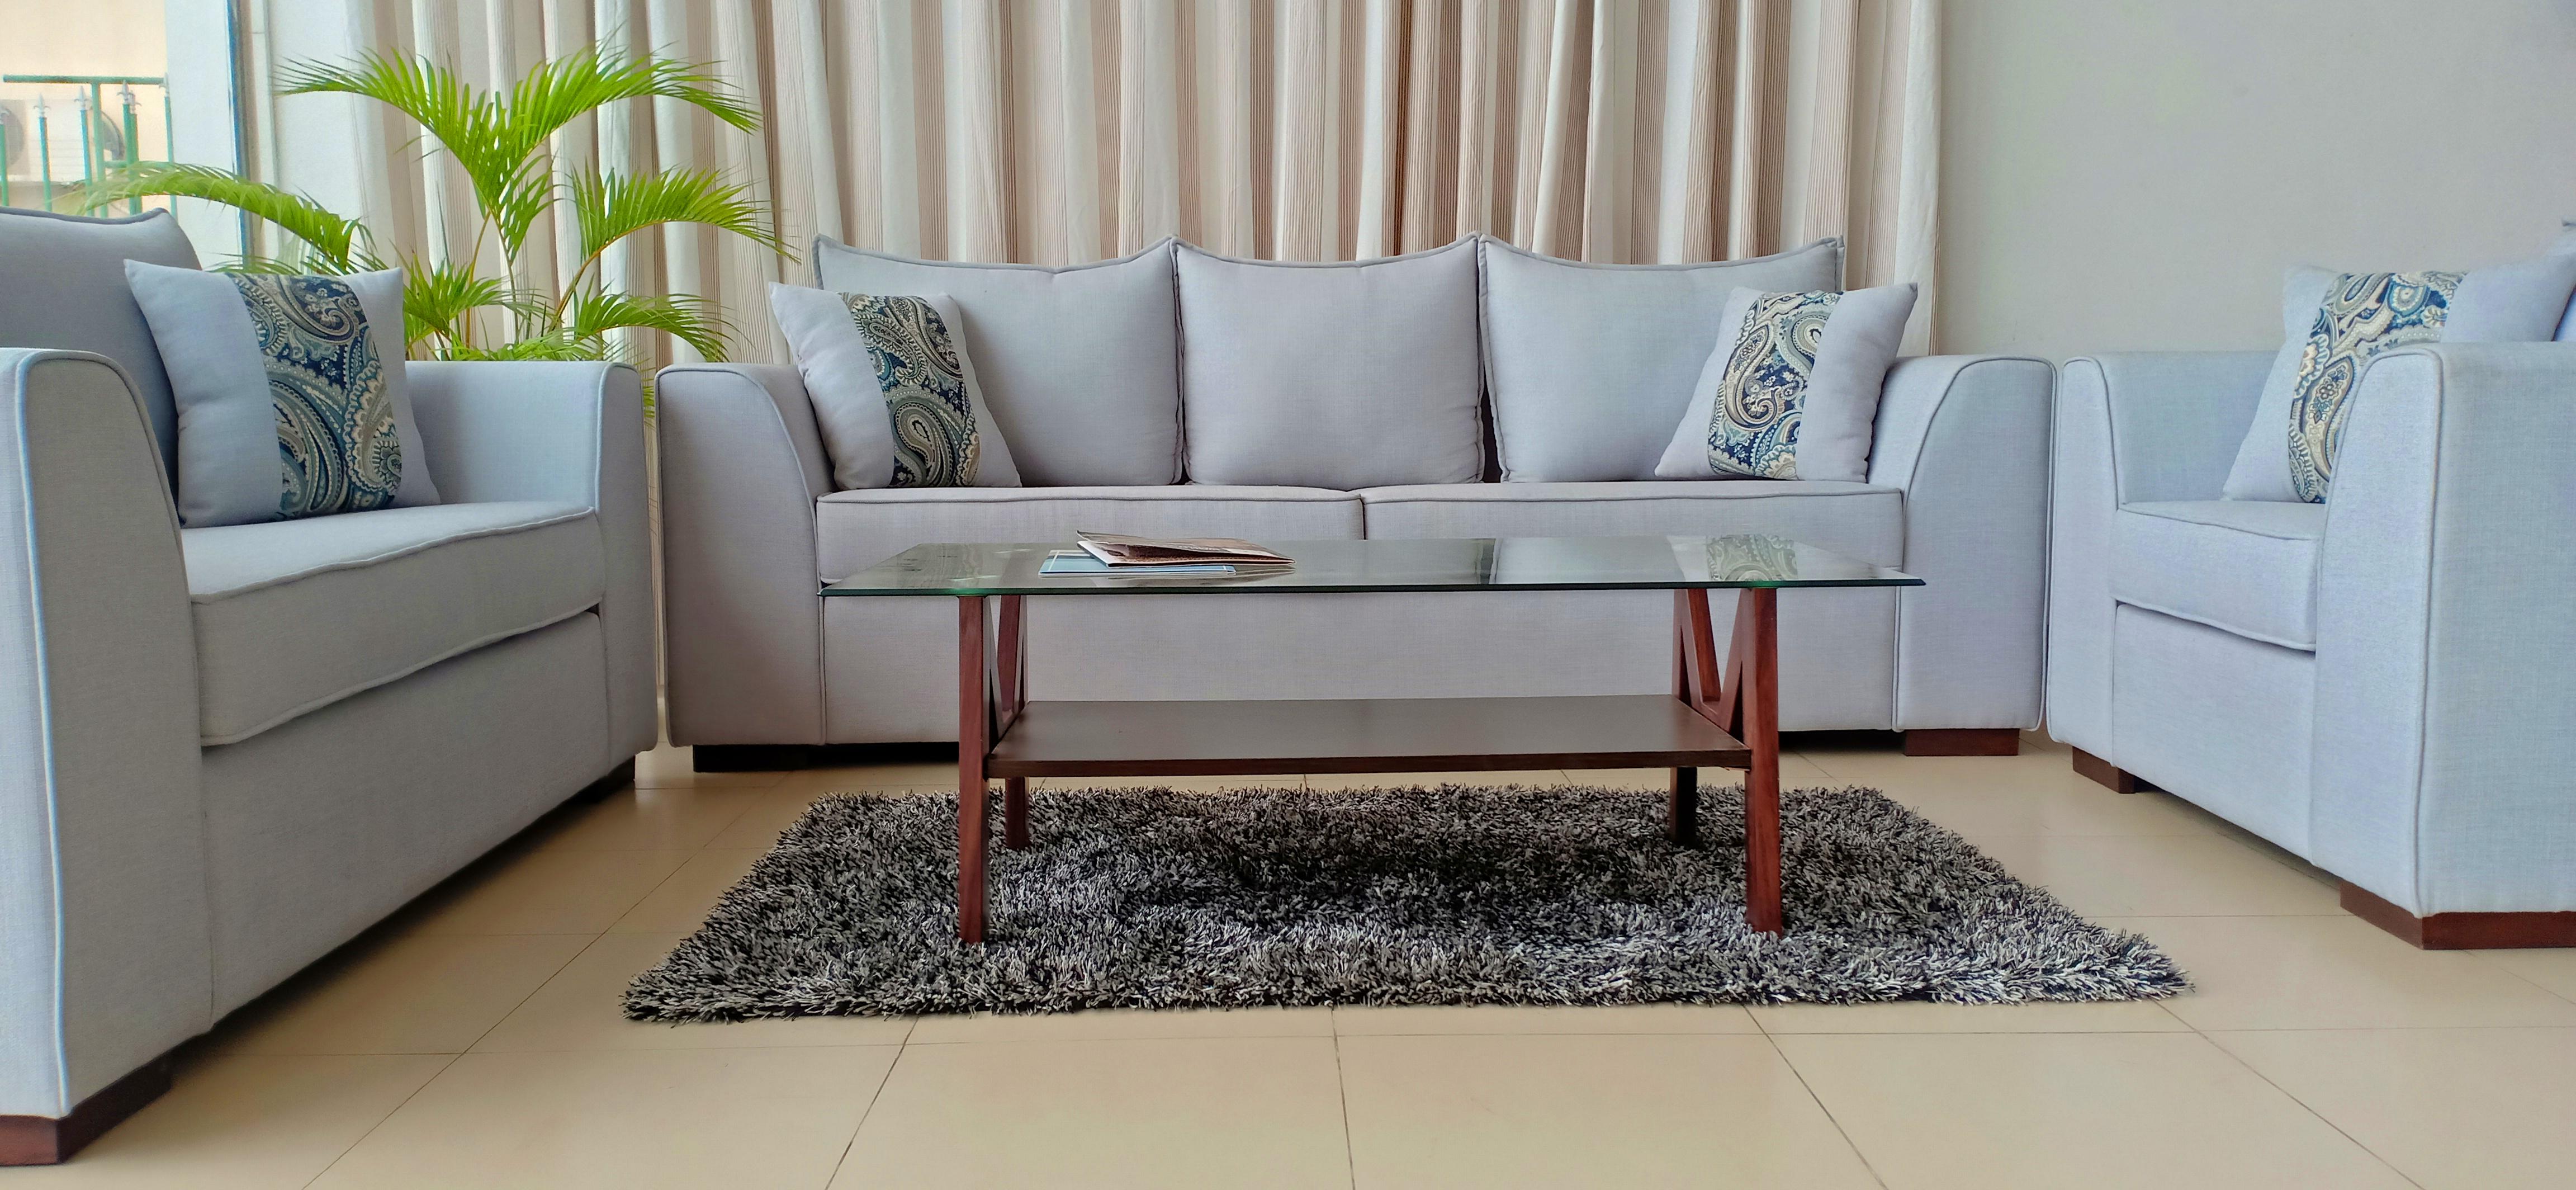 Sofa Homes – Sofa Homes